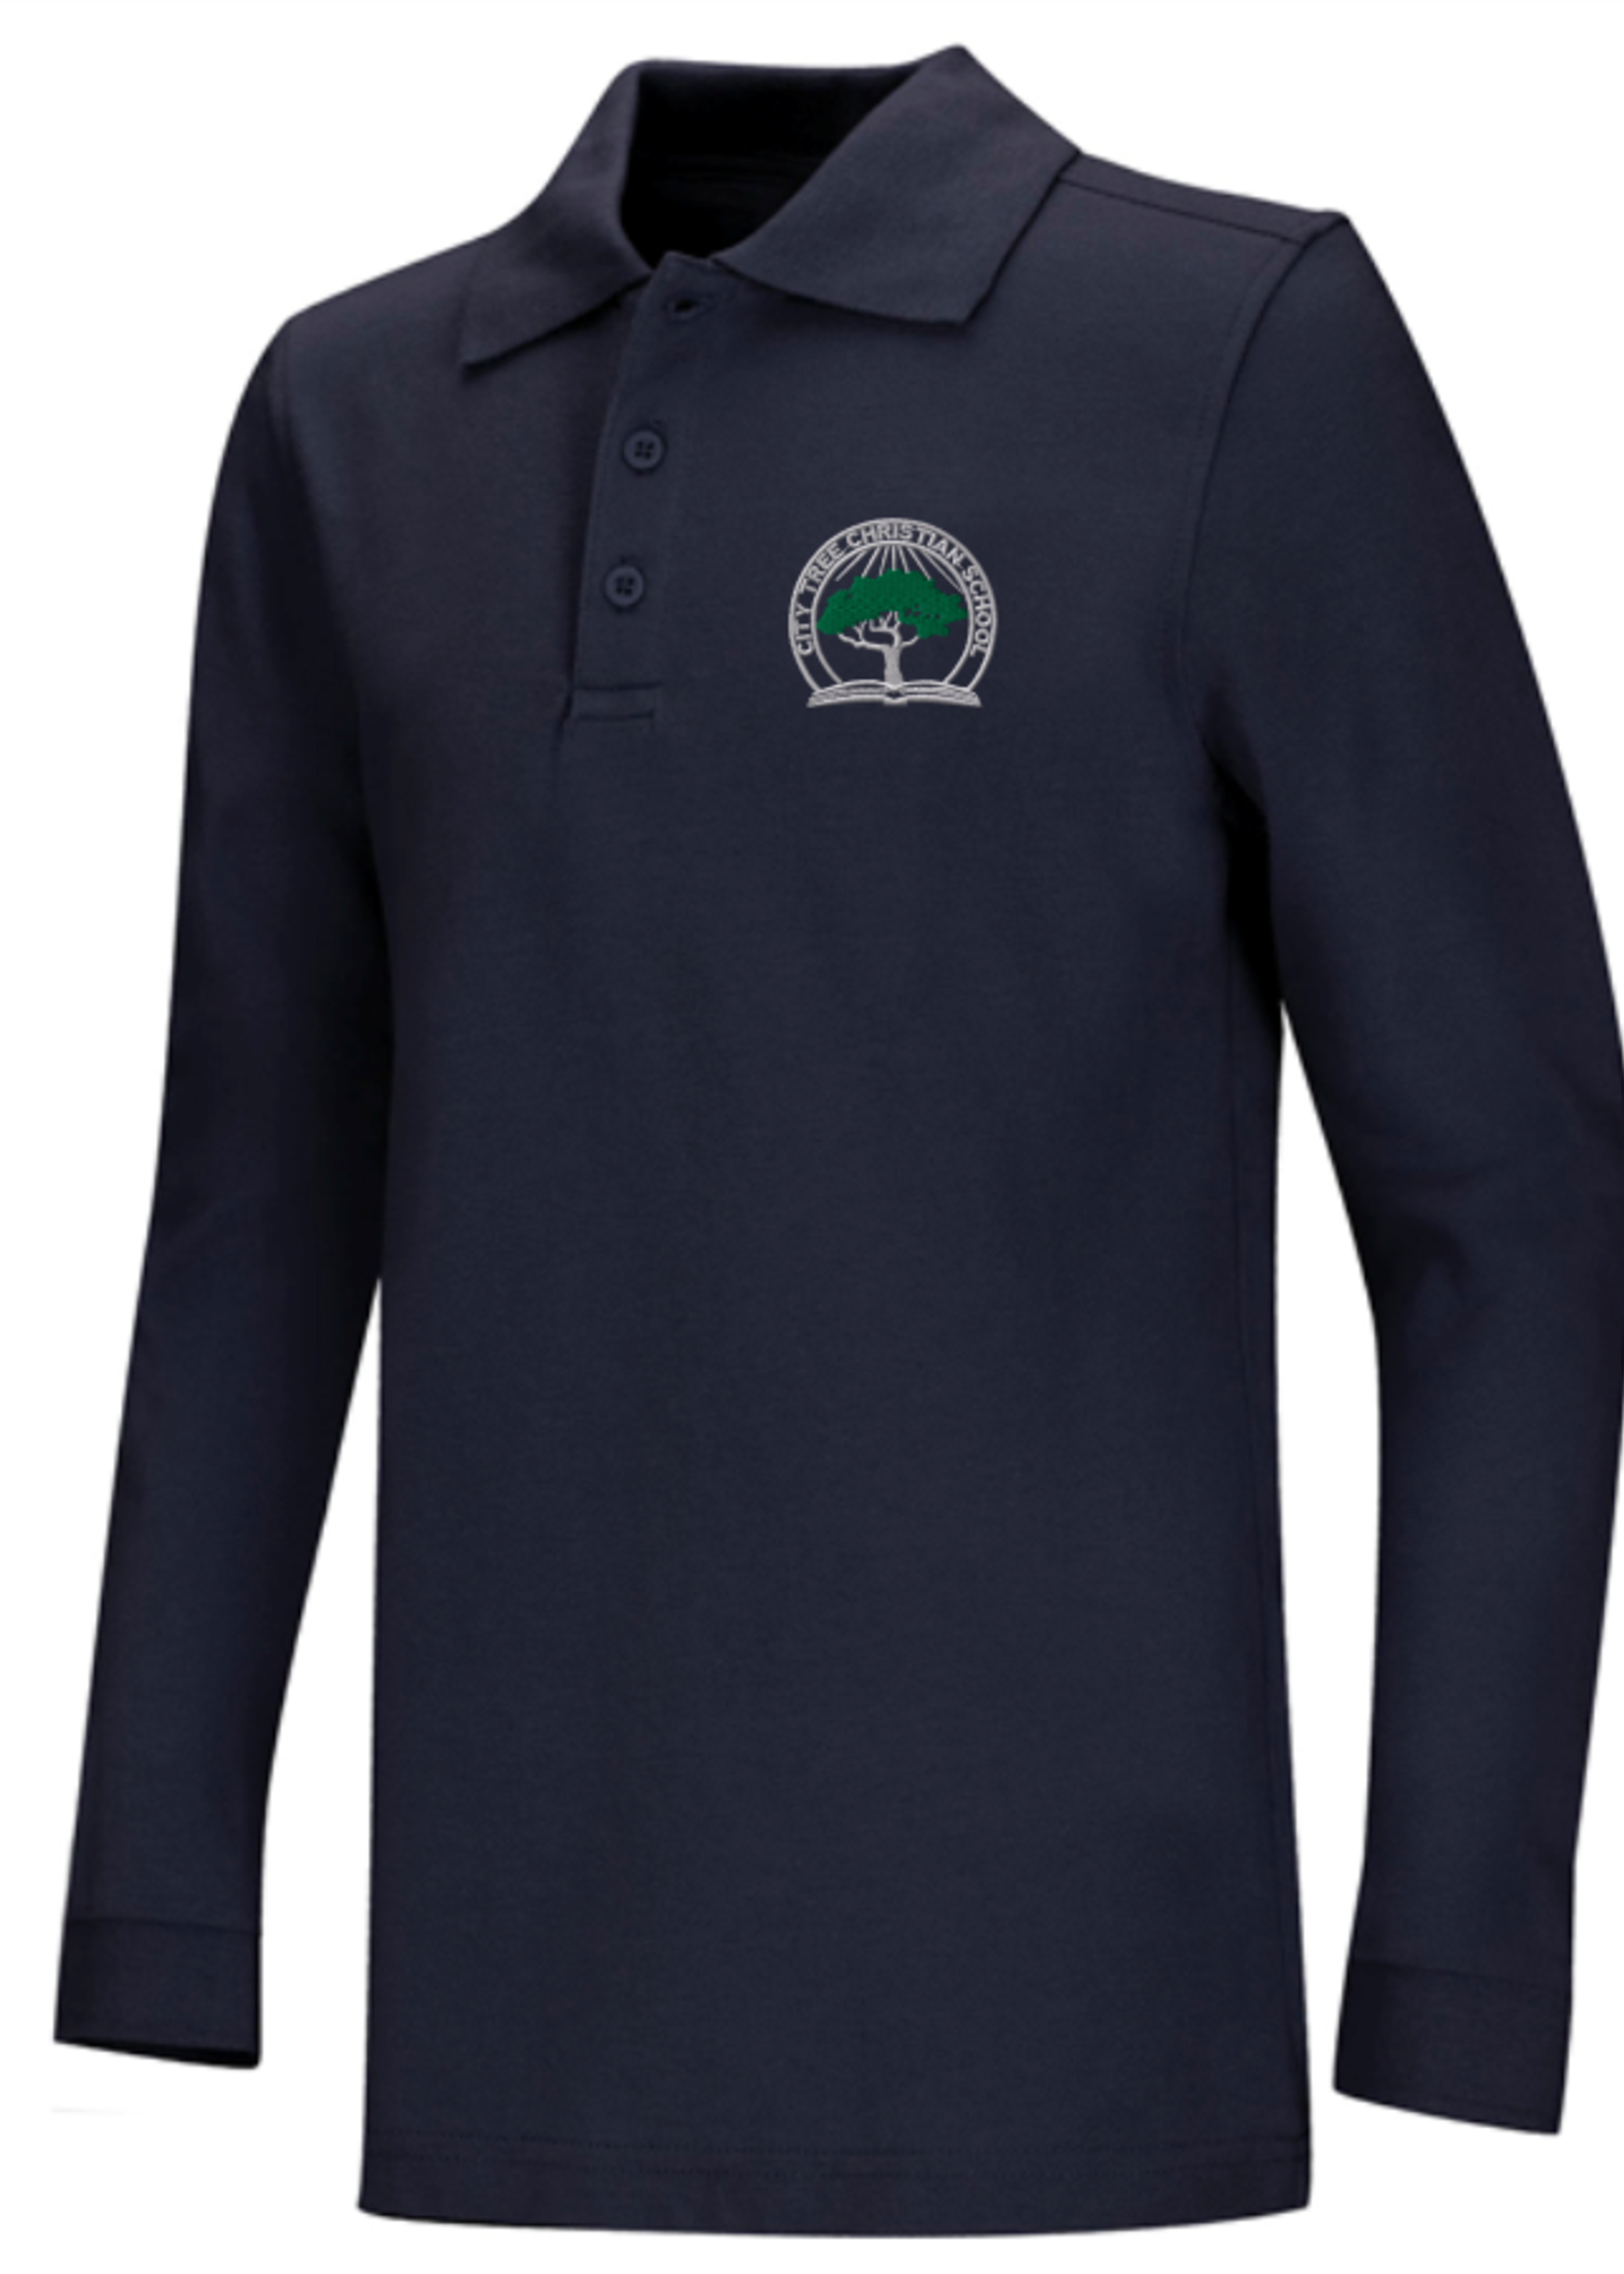 TUS CTCS Value Long Sleeve Pique Polo